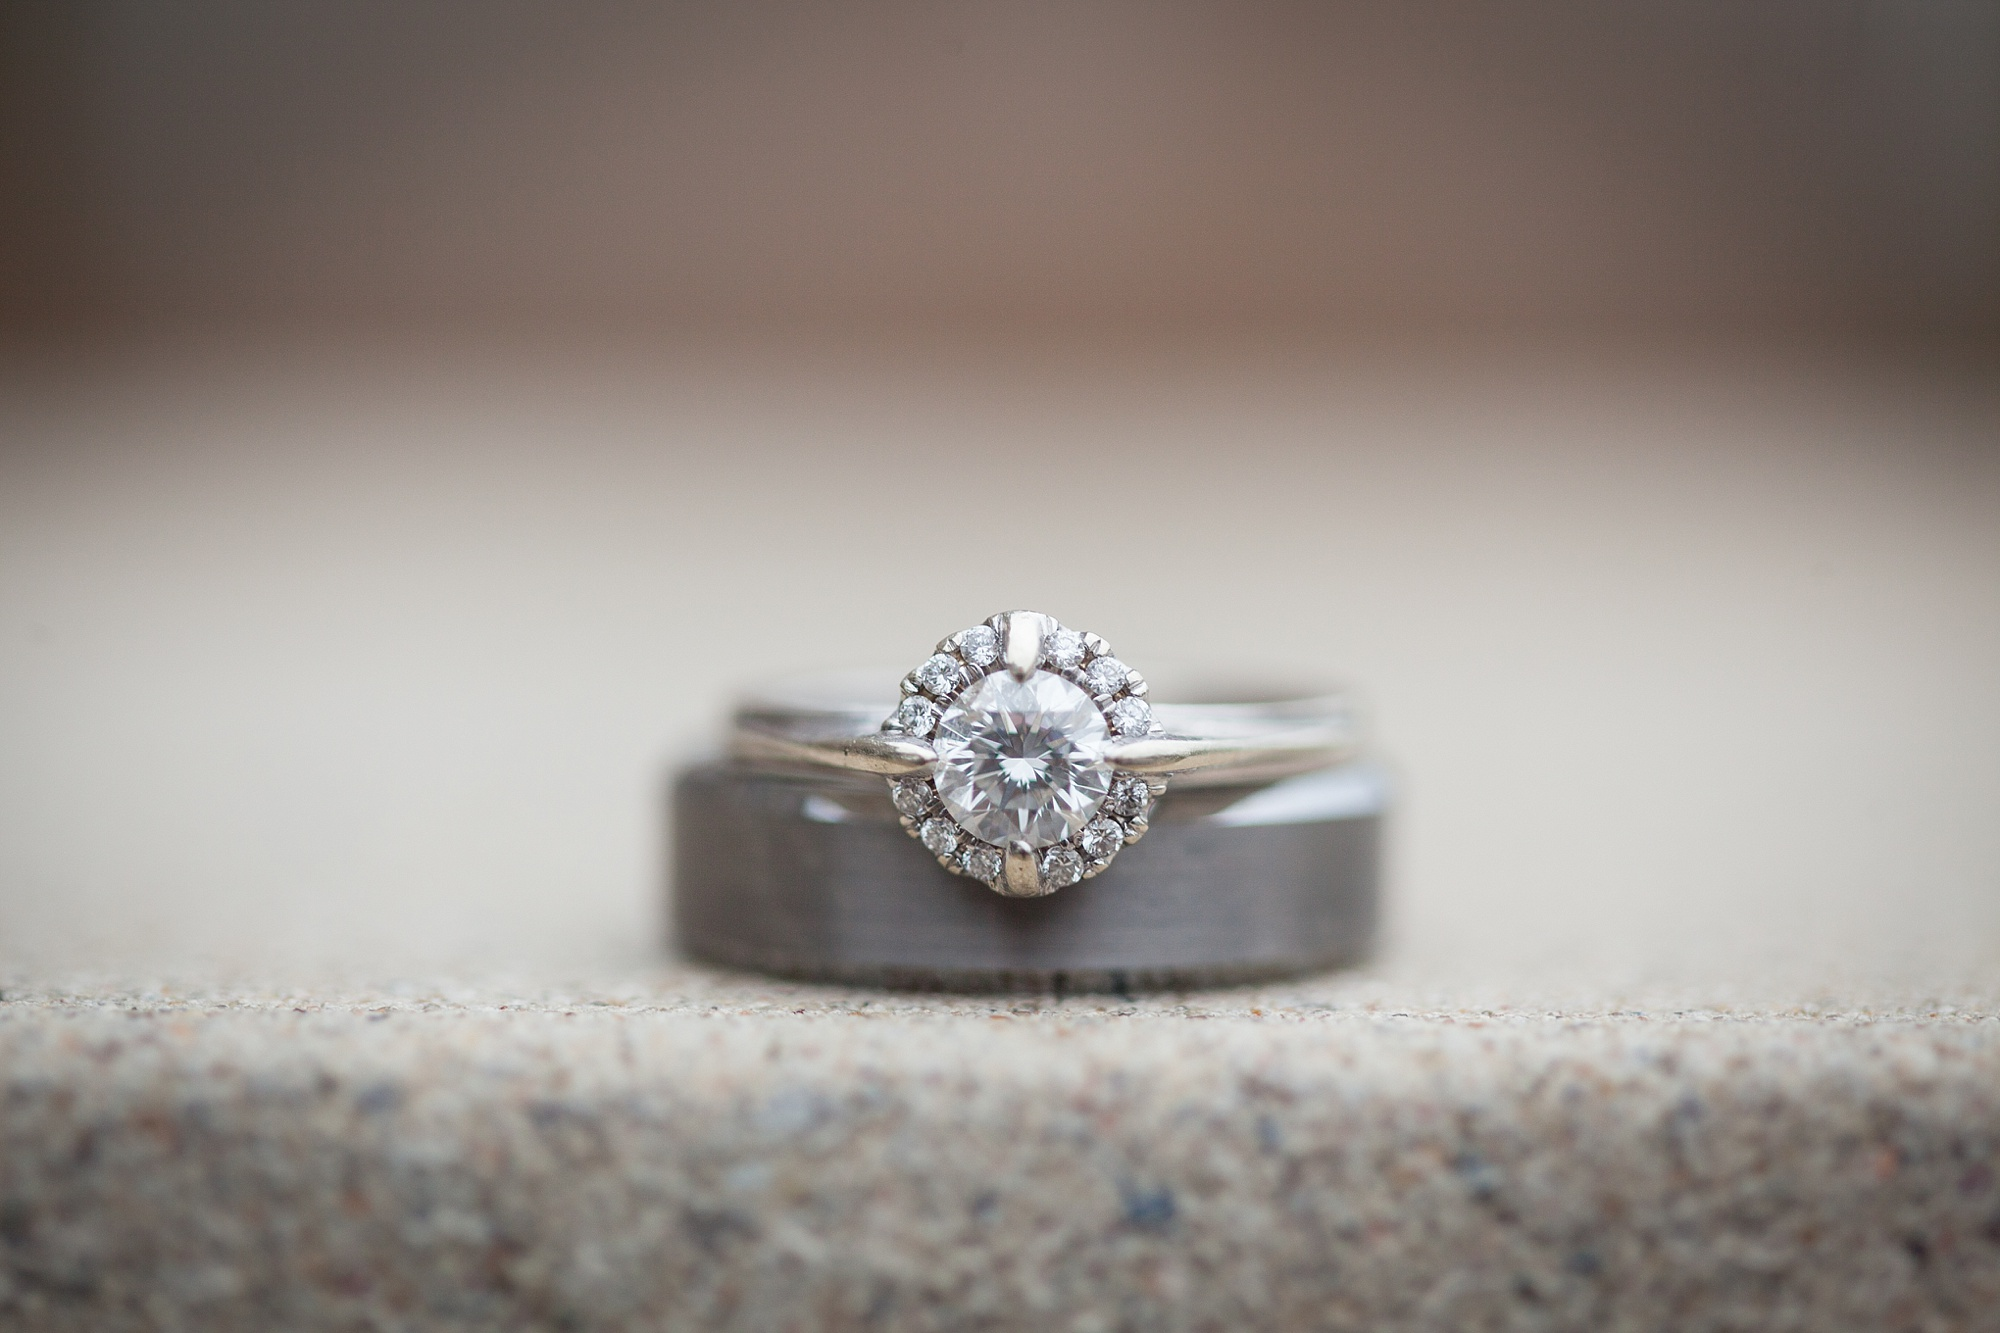 Brandon_Shafer_Photography_Lauren_Ethan_New_Vintage_Place_Grand_Rapids_Wedding_0003.jpg